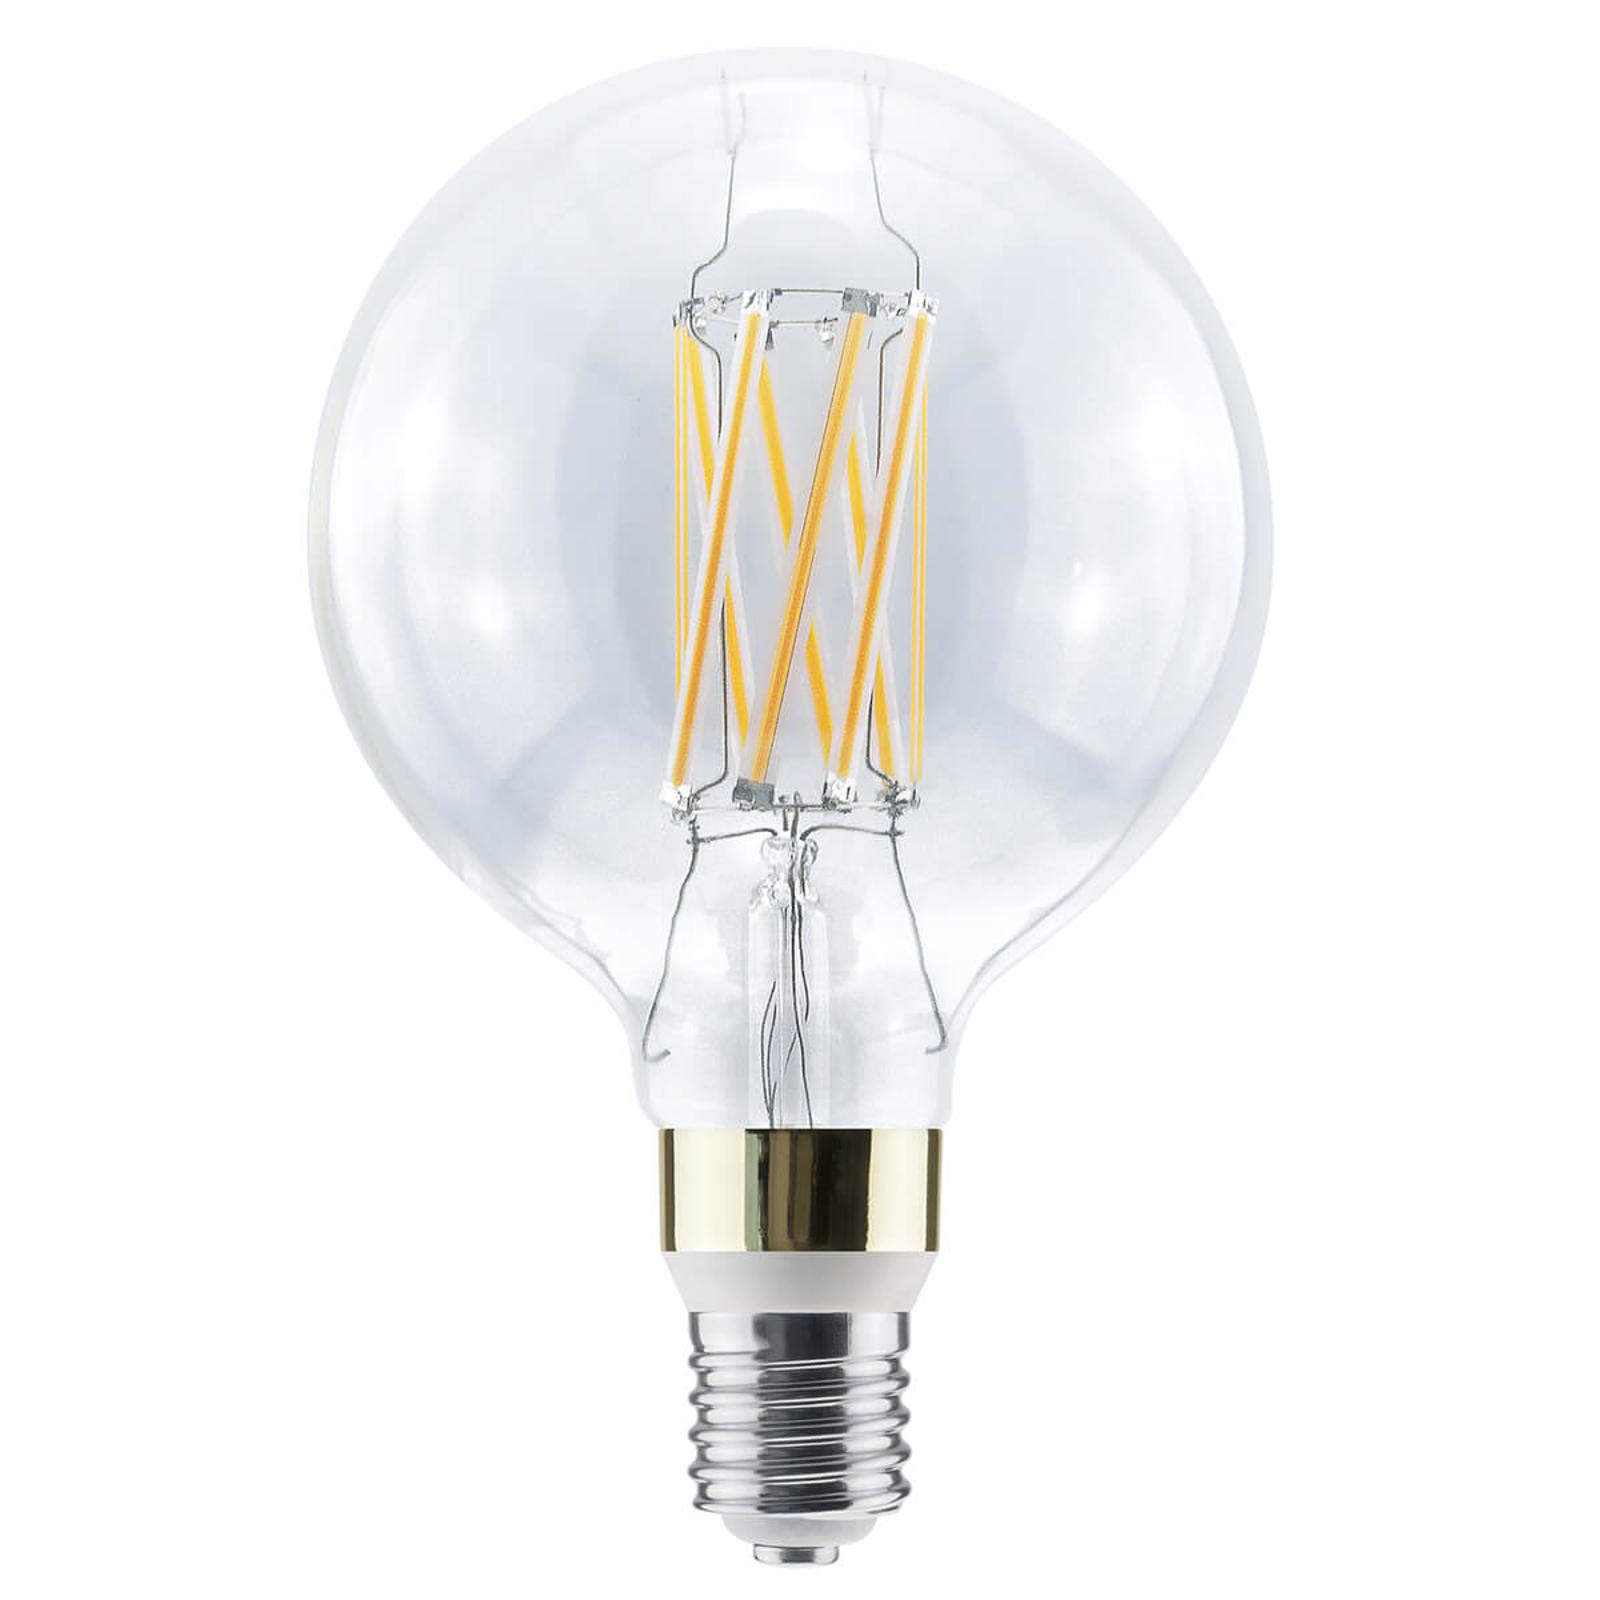 LED-Globe E40 30W, warmweiß, 2.370 Lumen